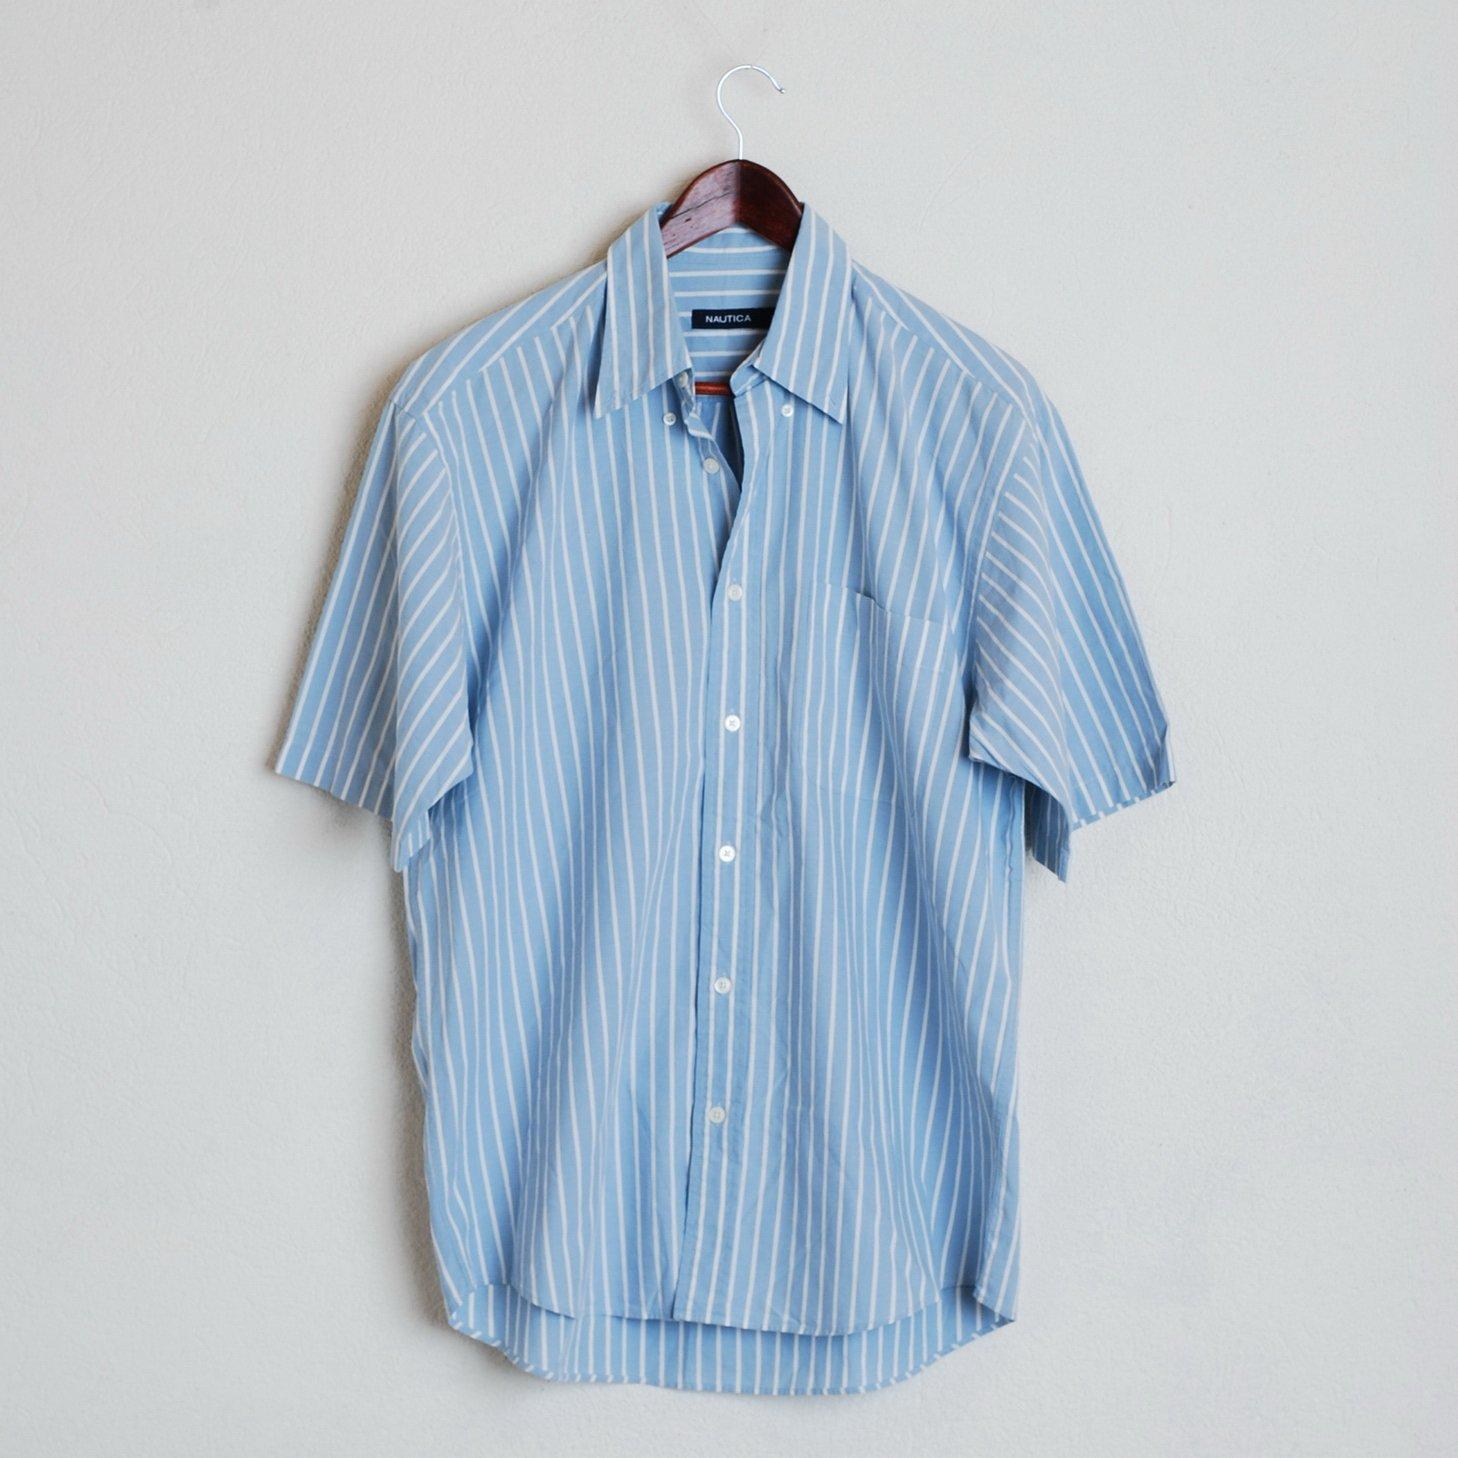 Nautica Nautica Mens M Blue Striped Casual Shirt Short Sleeve Summer